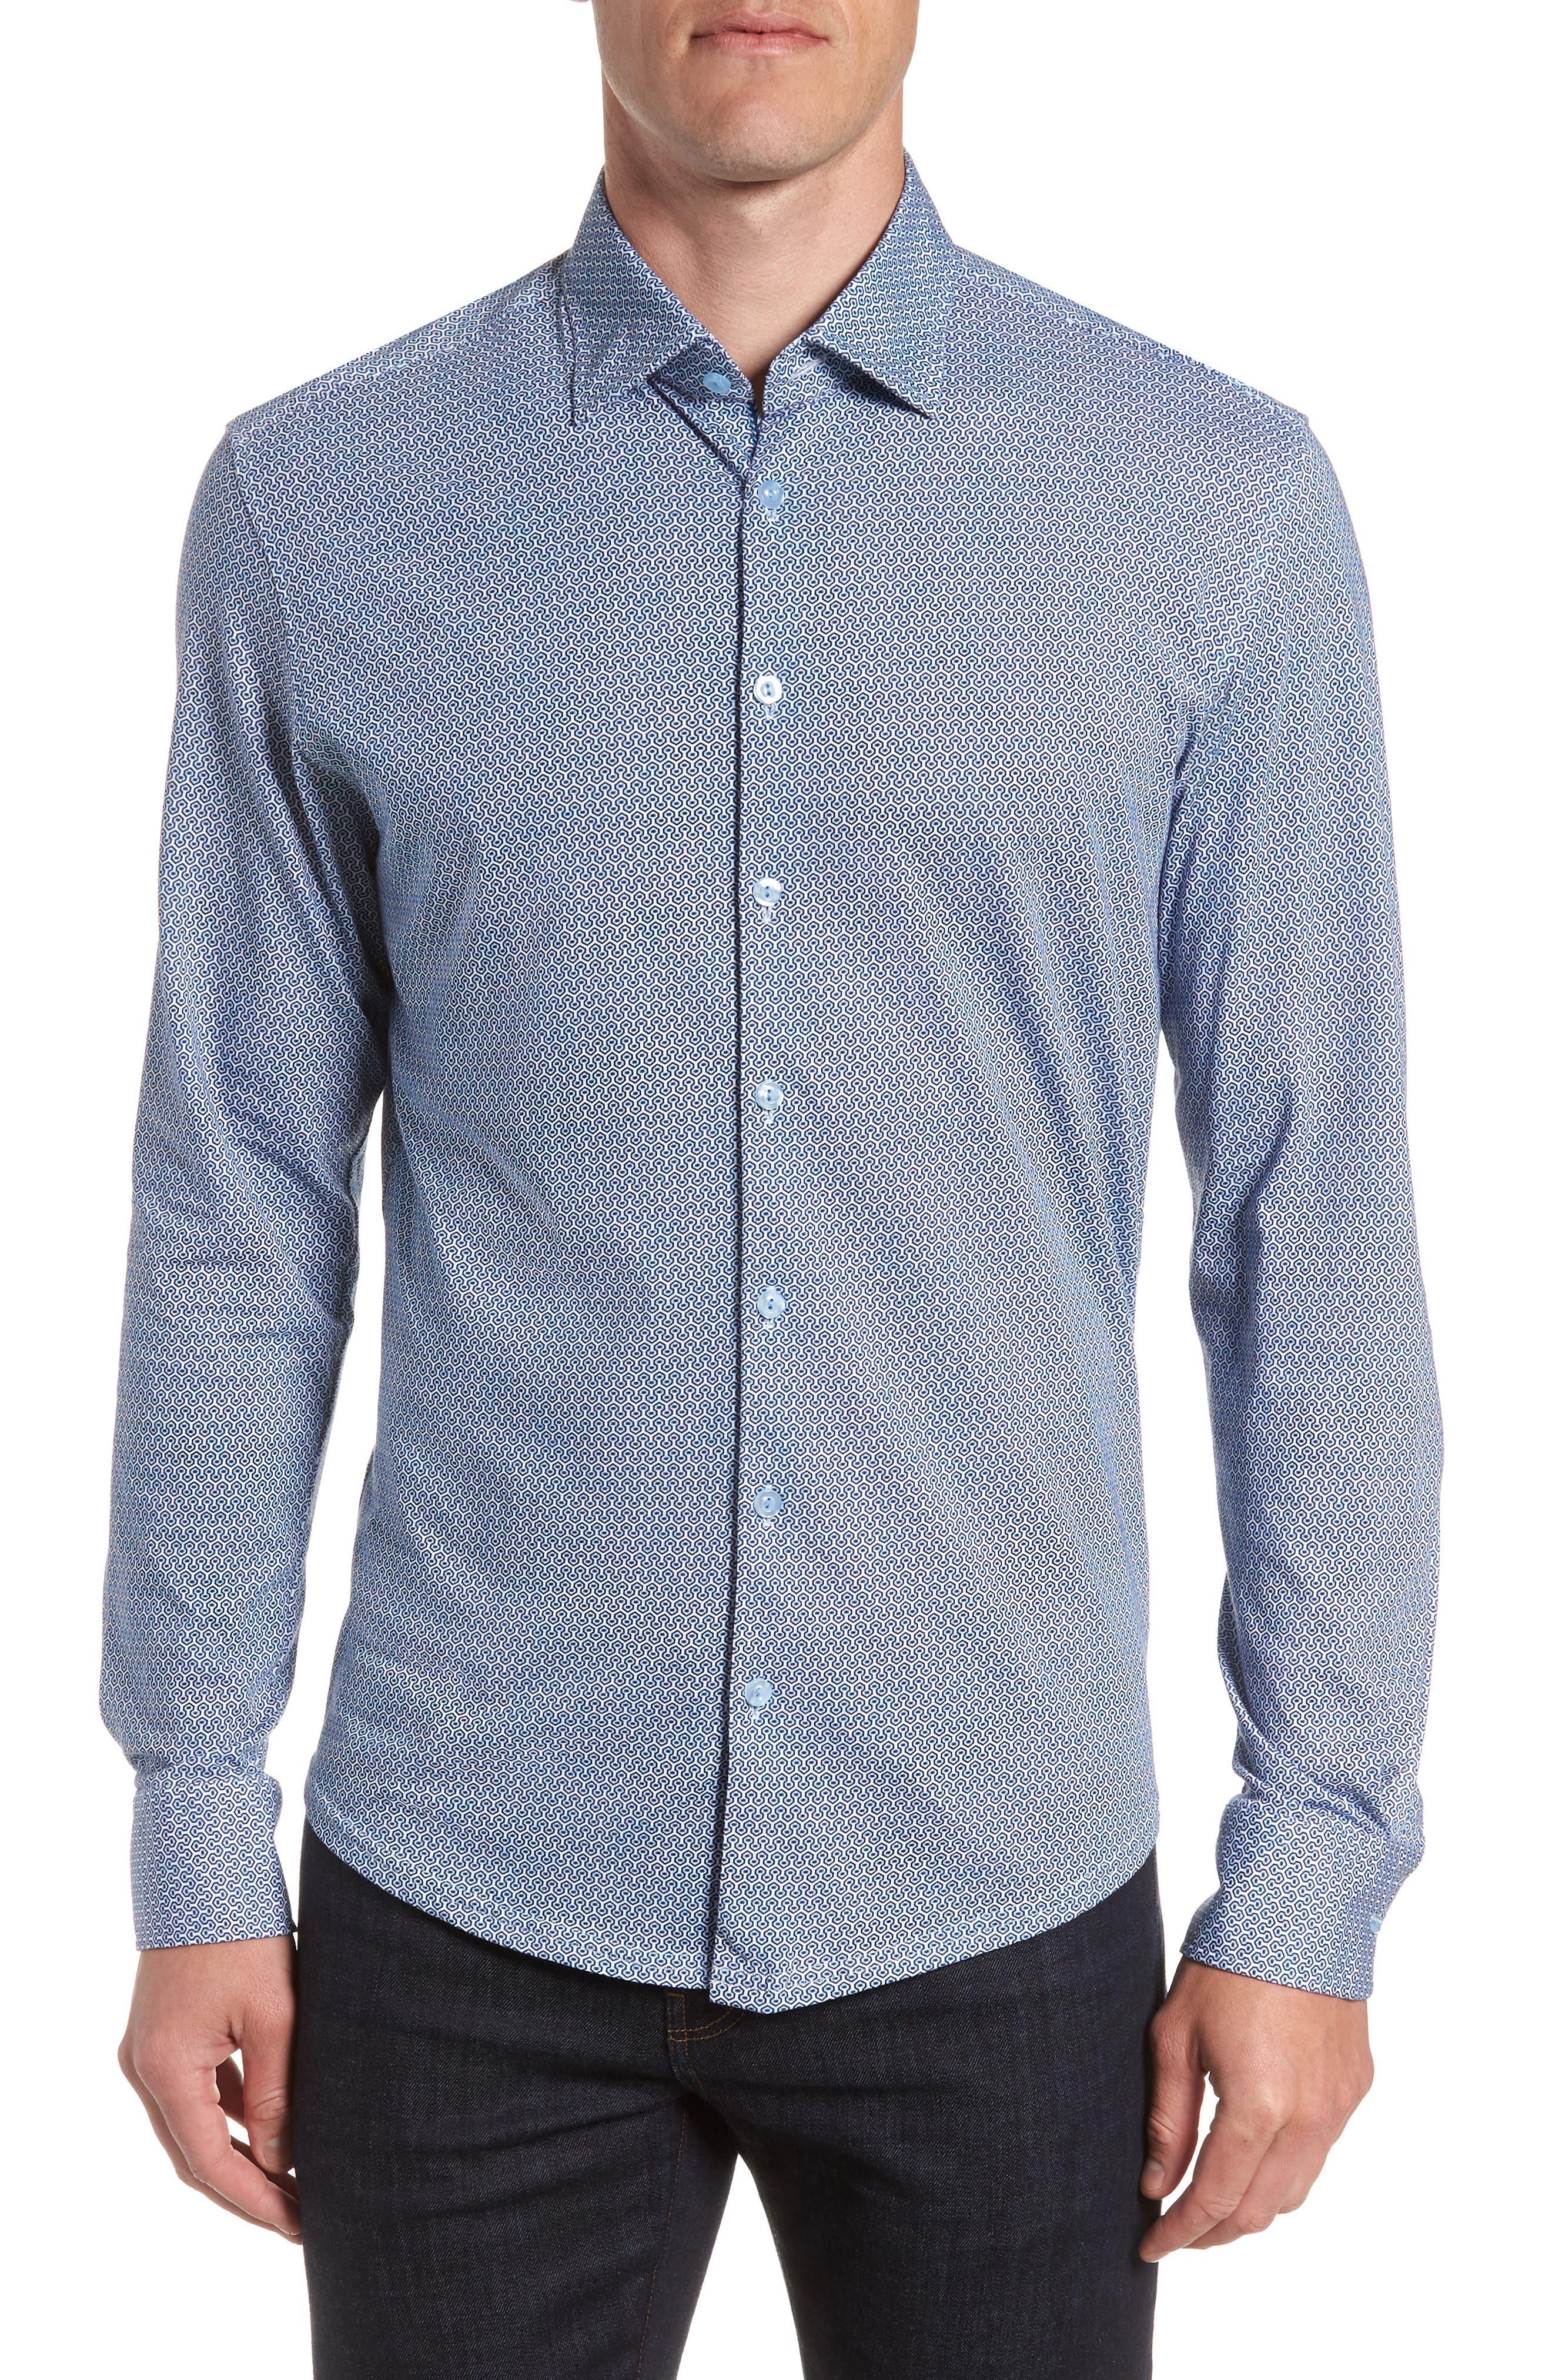 Honeycomb Print Knit Sport Shirt,                         Main,                         color, Blue